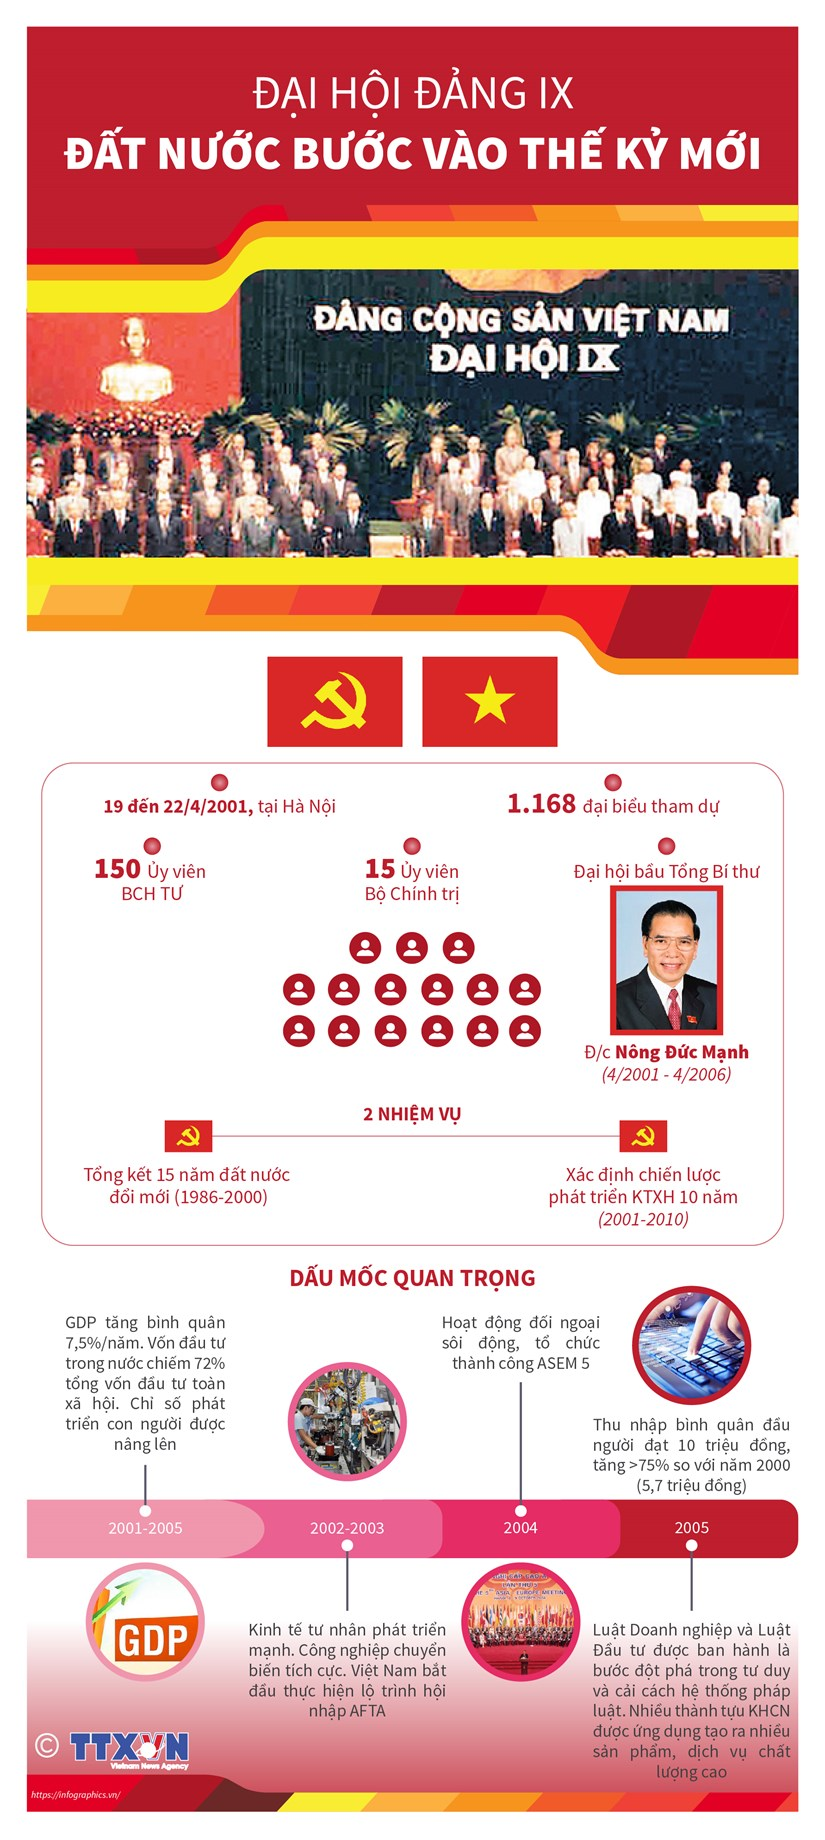 [Infographics] Dai hoi Dang IX: Dat nuoc buoc vao the ky moi hinh anh 1